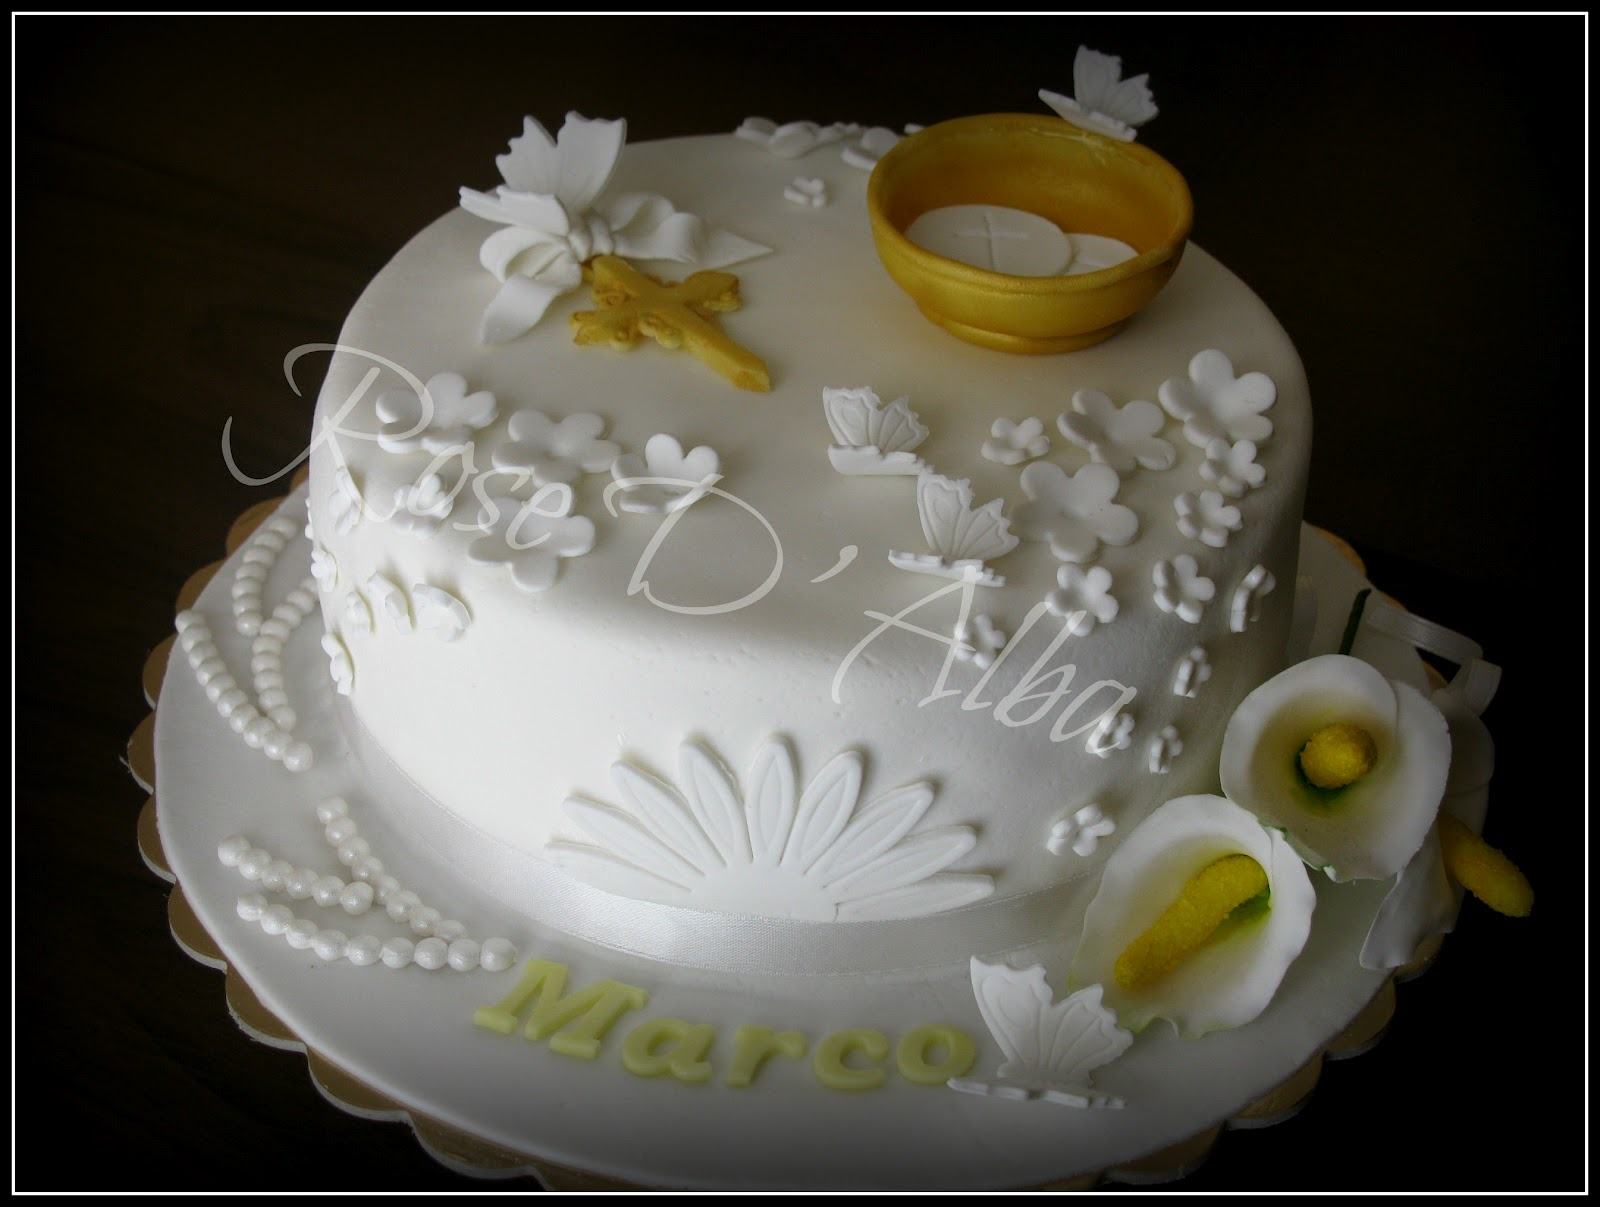 Famoso ROSE D' ALBA cake designer: maggio 2012 PB52